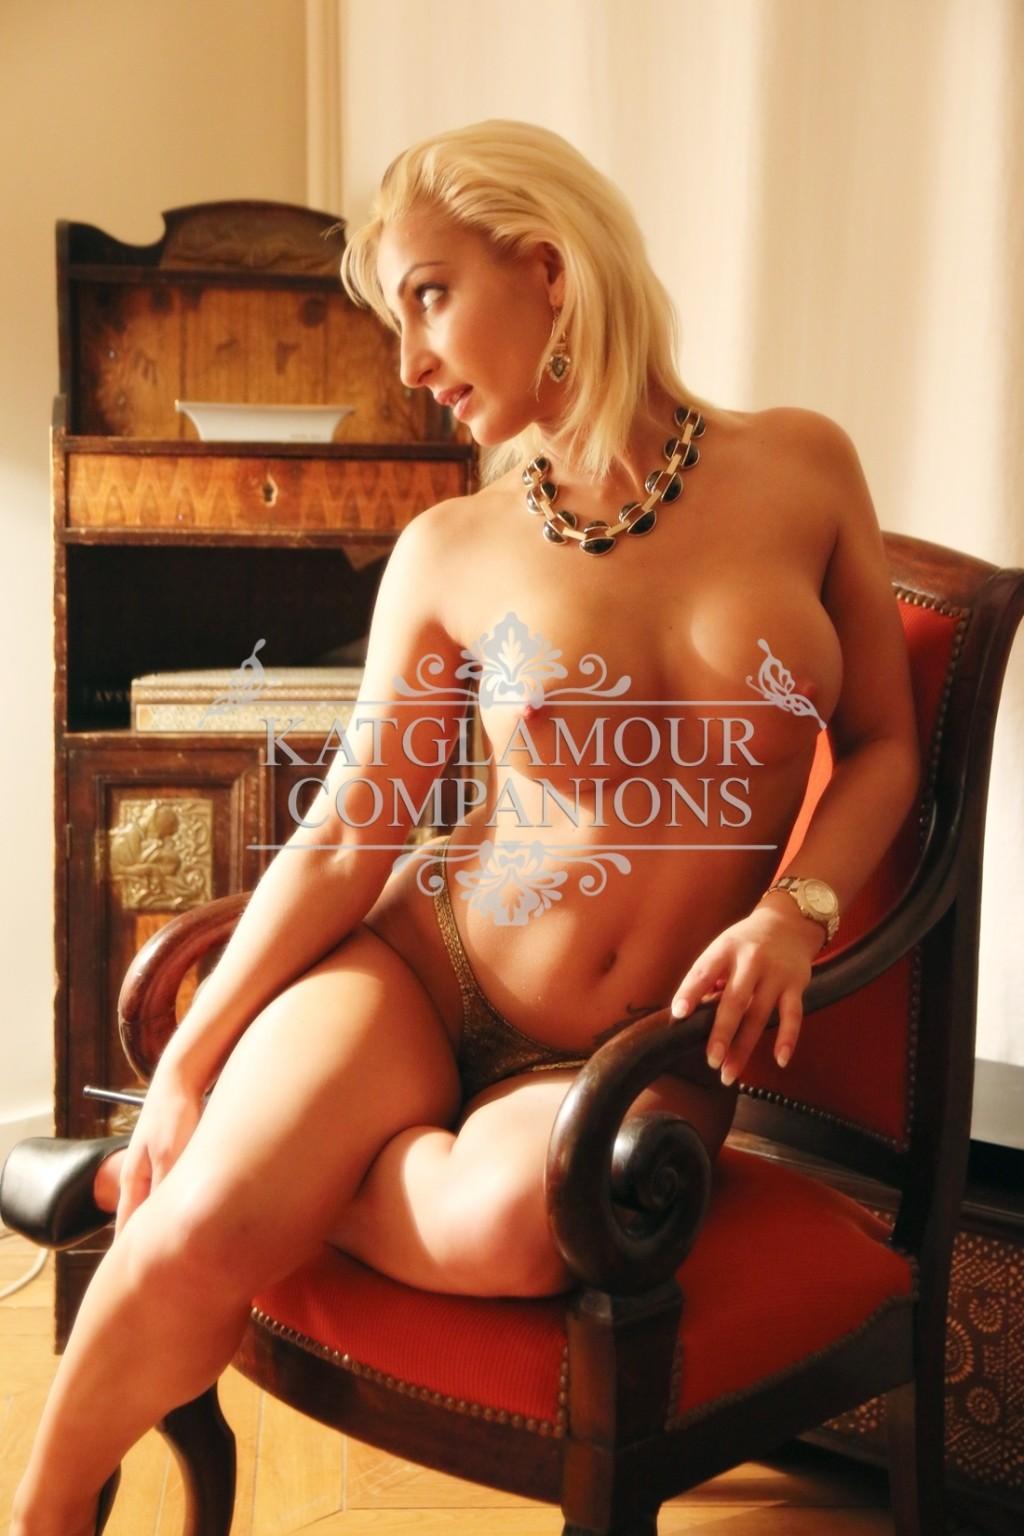 sensual girl girl massage escort doll